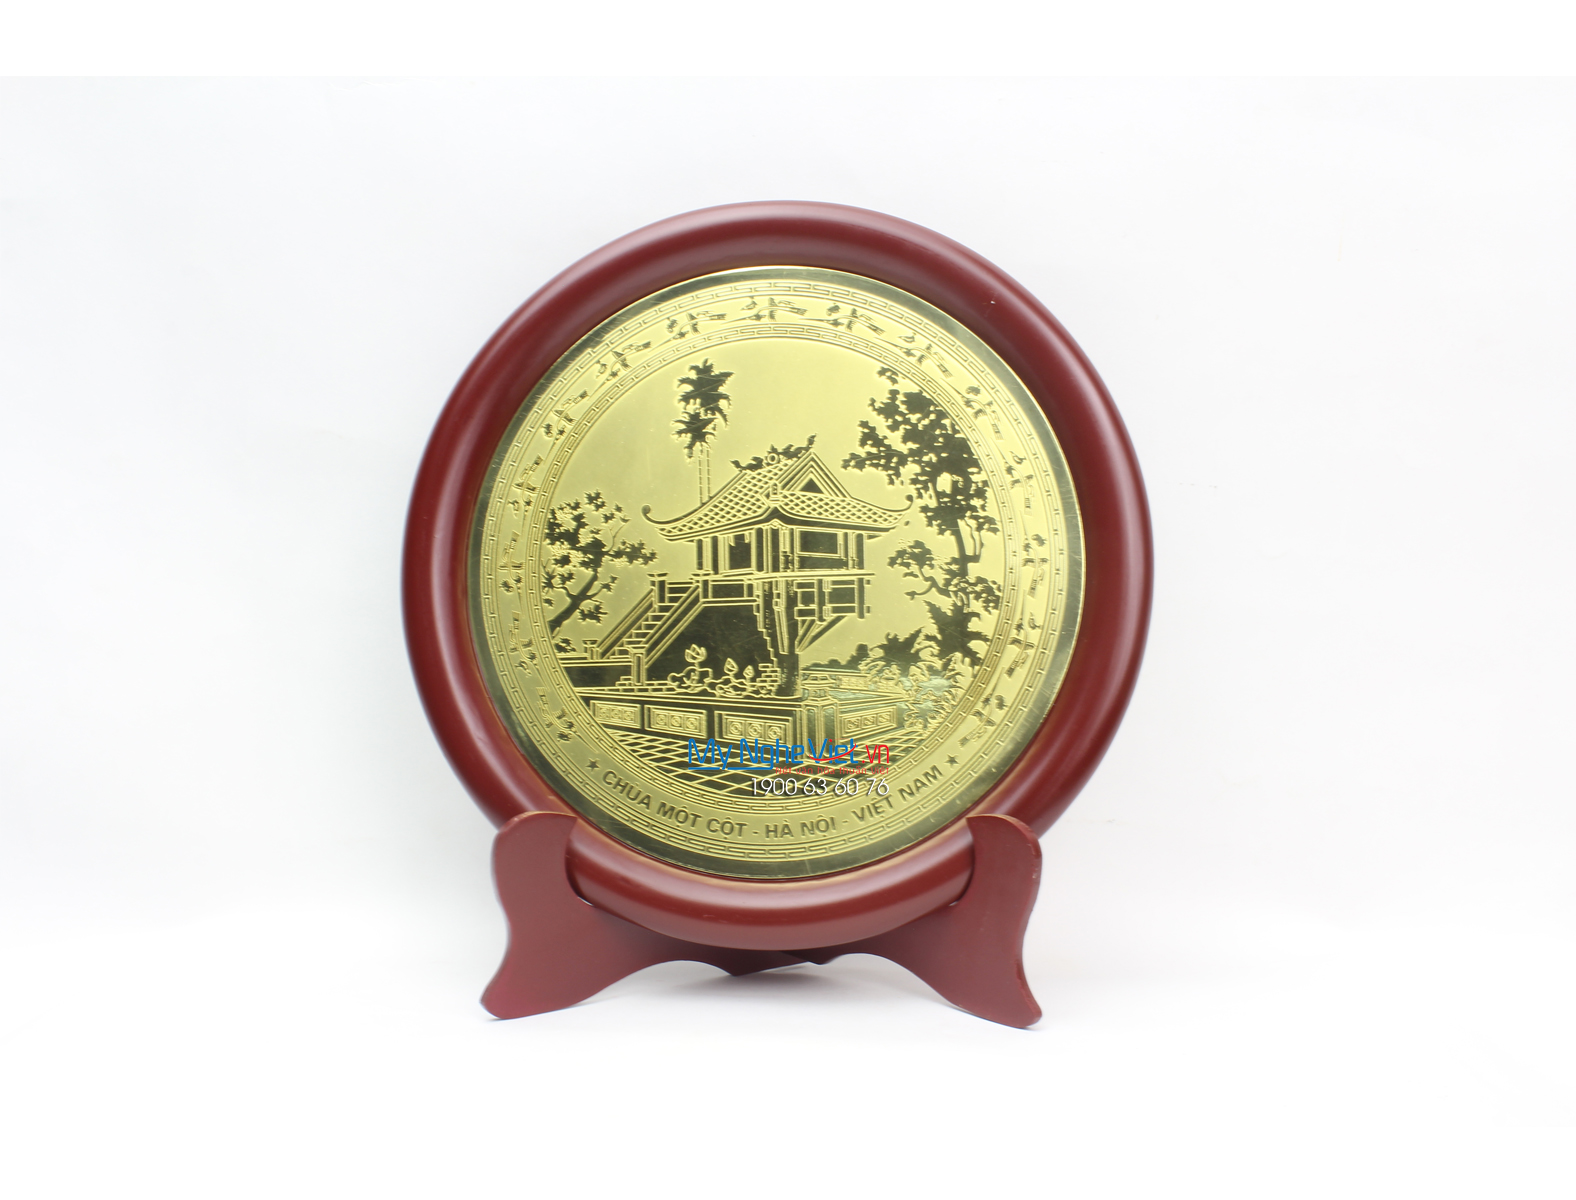 Đĩa đồng lưu niệm MNV-DD04